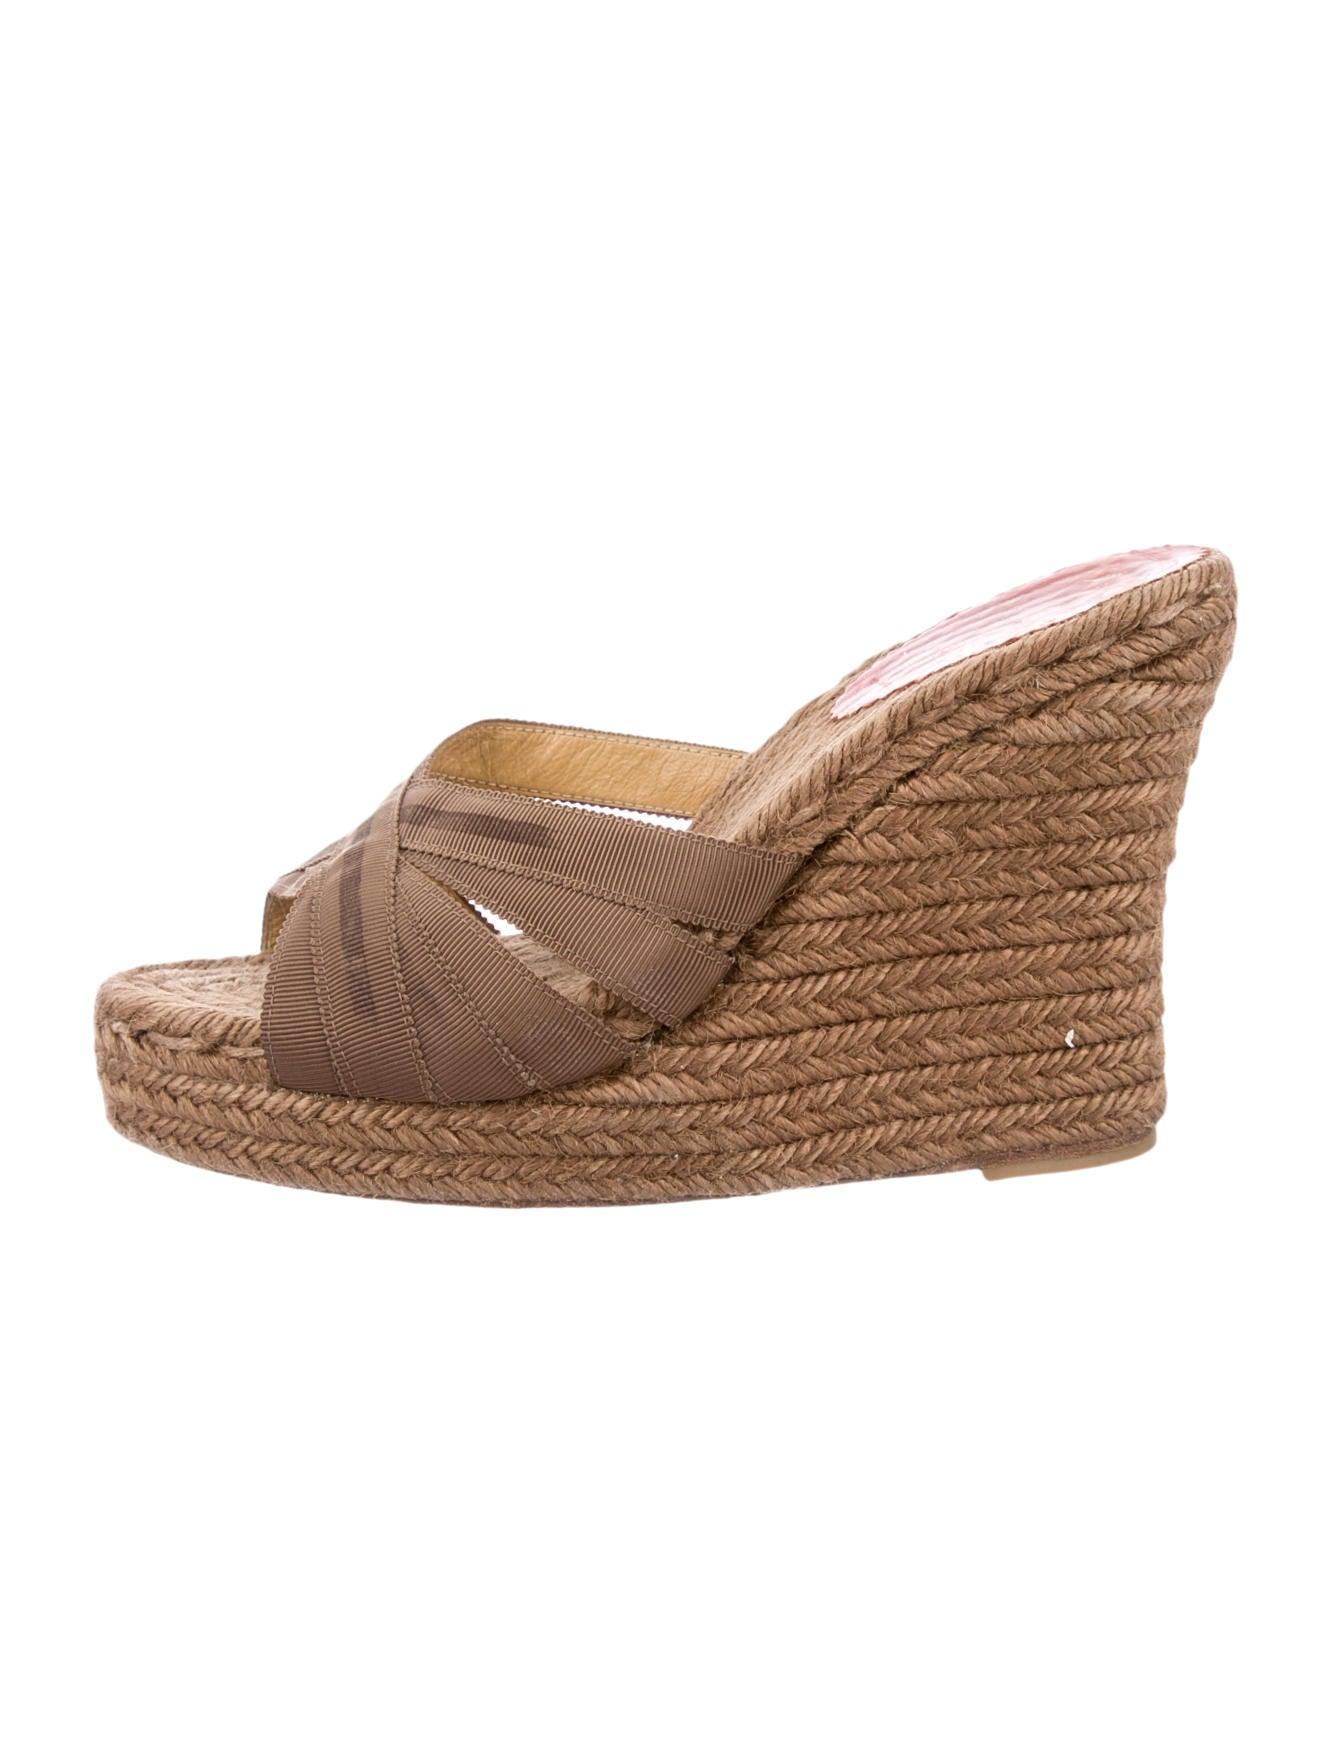 christian louboutin round-toe sandals Brown ribbon | The Filipino ...